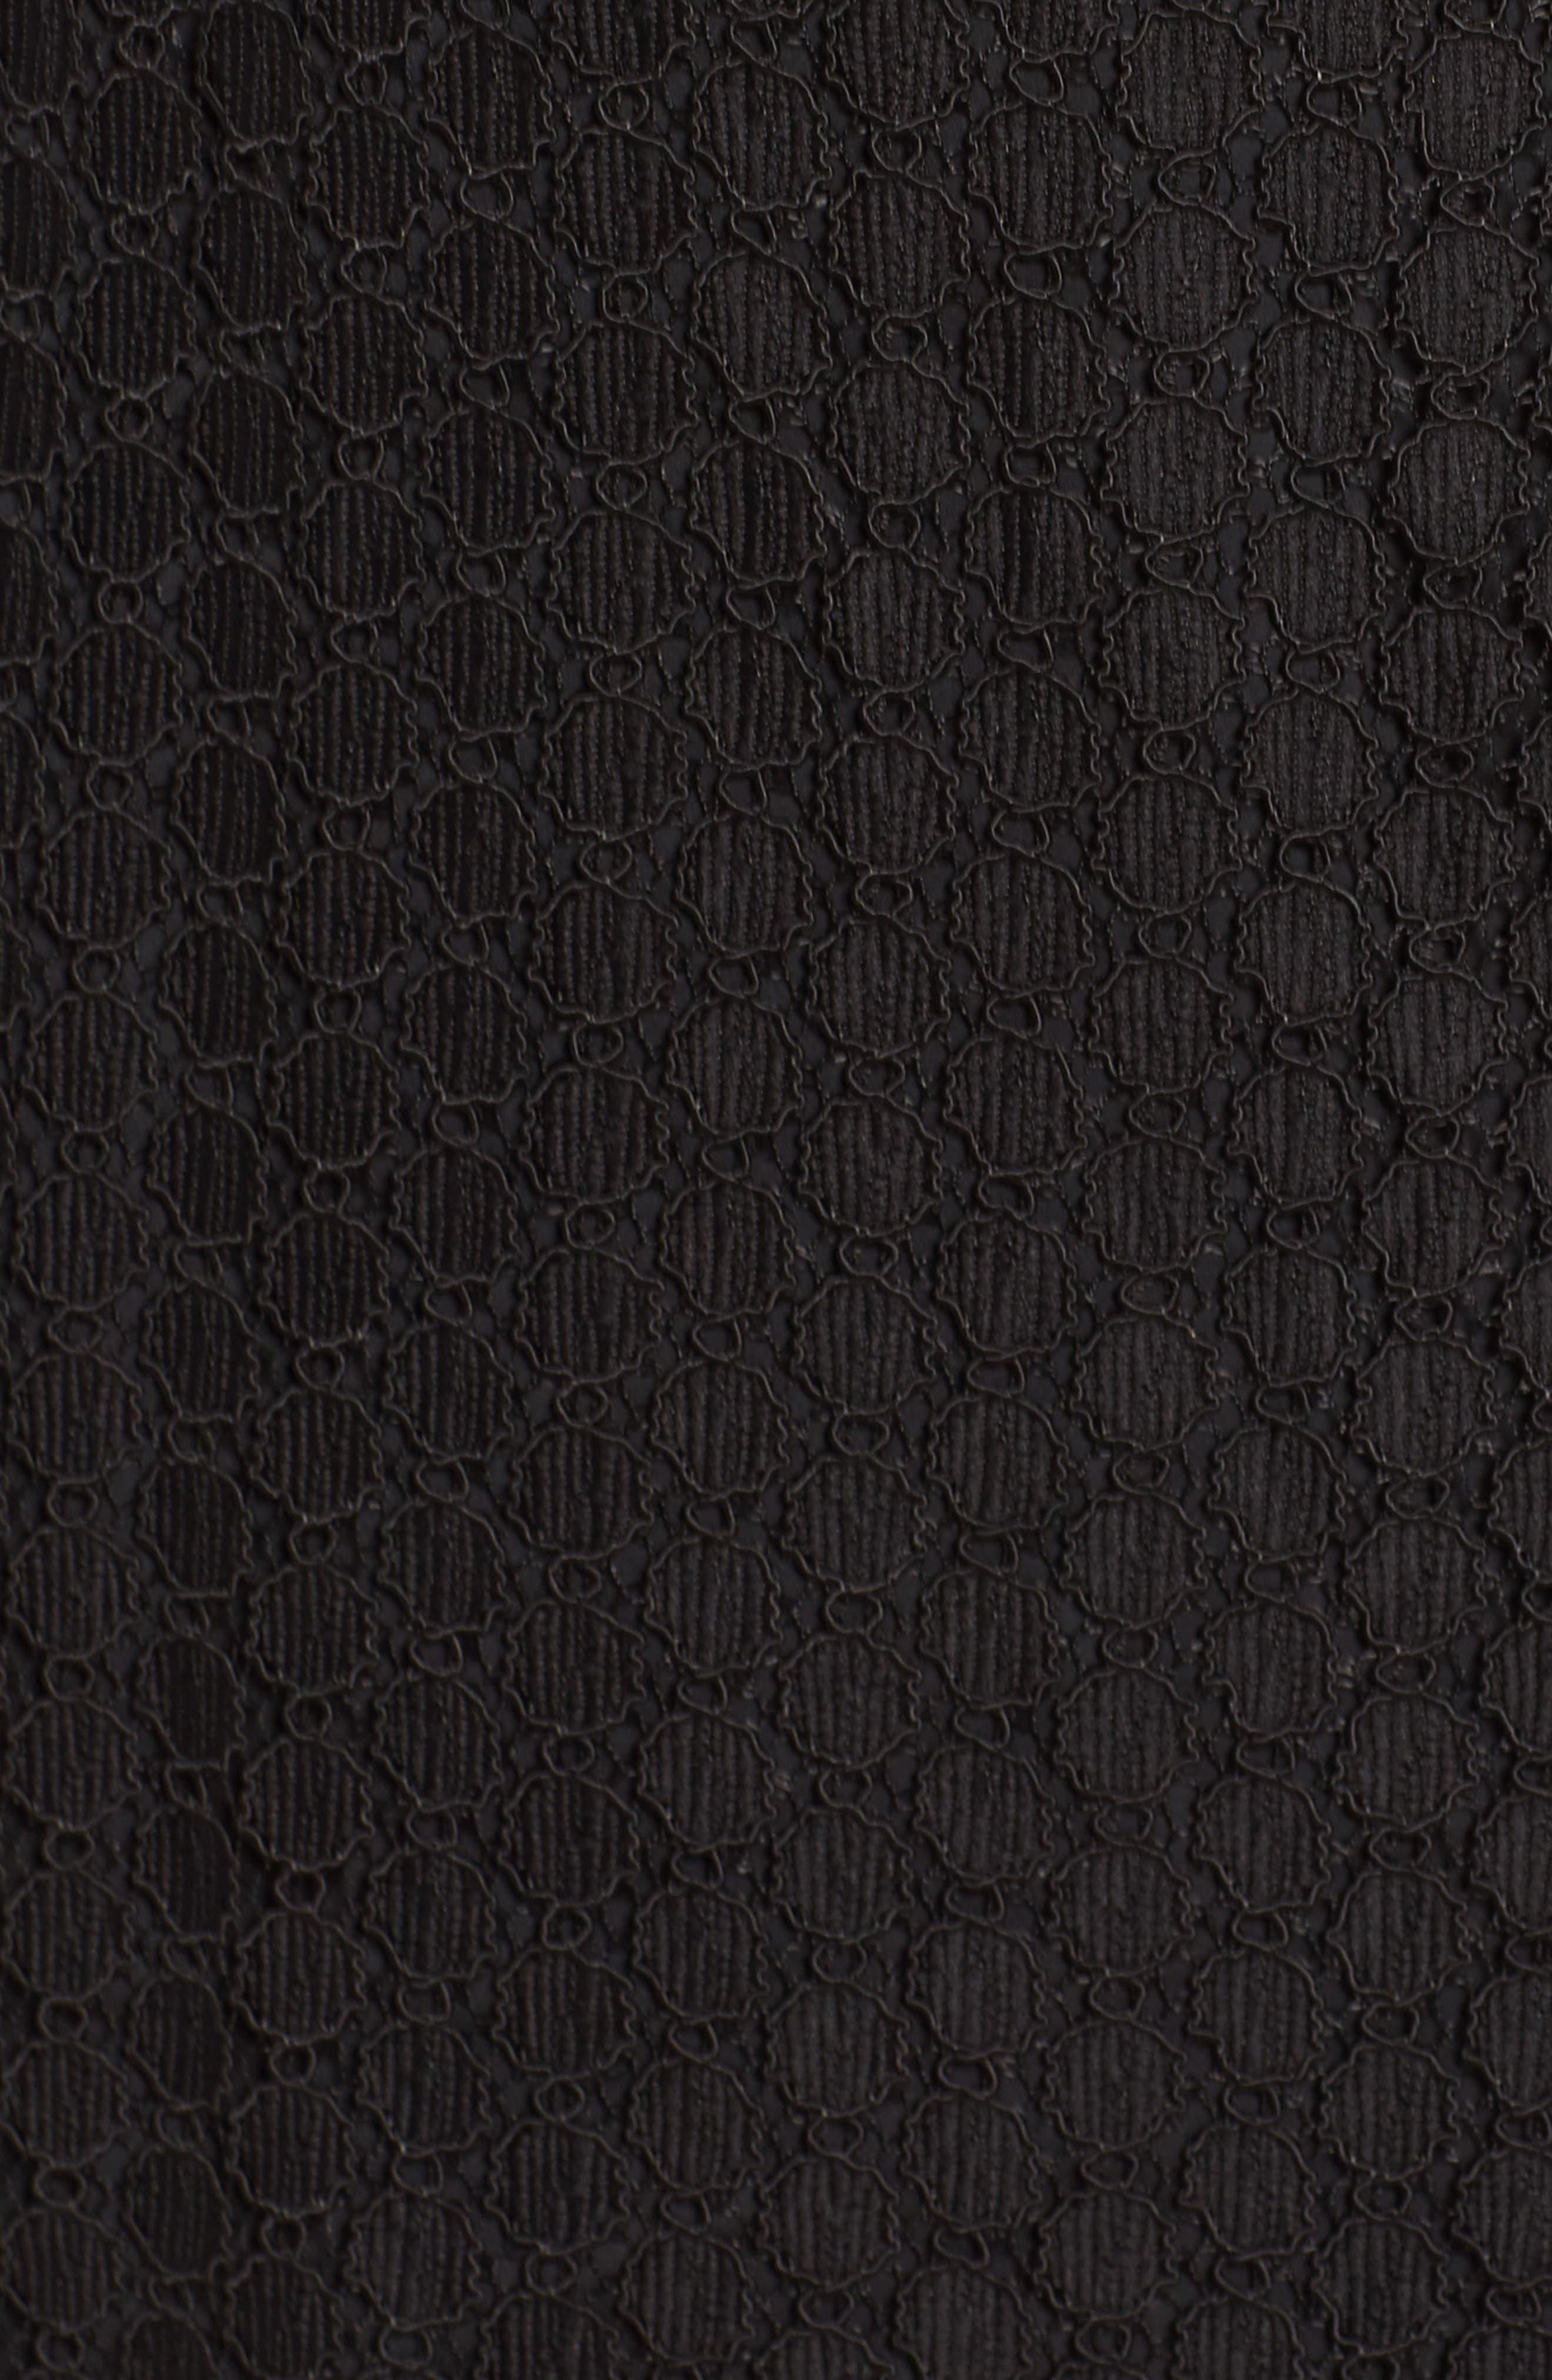 Pearl Lace & Velvet Fit & Flare Dress,                             Alternate thumbnail 5, color,                             001